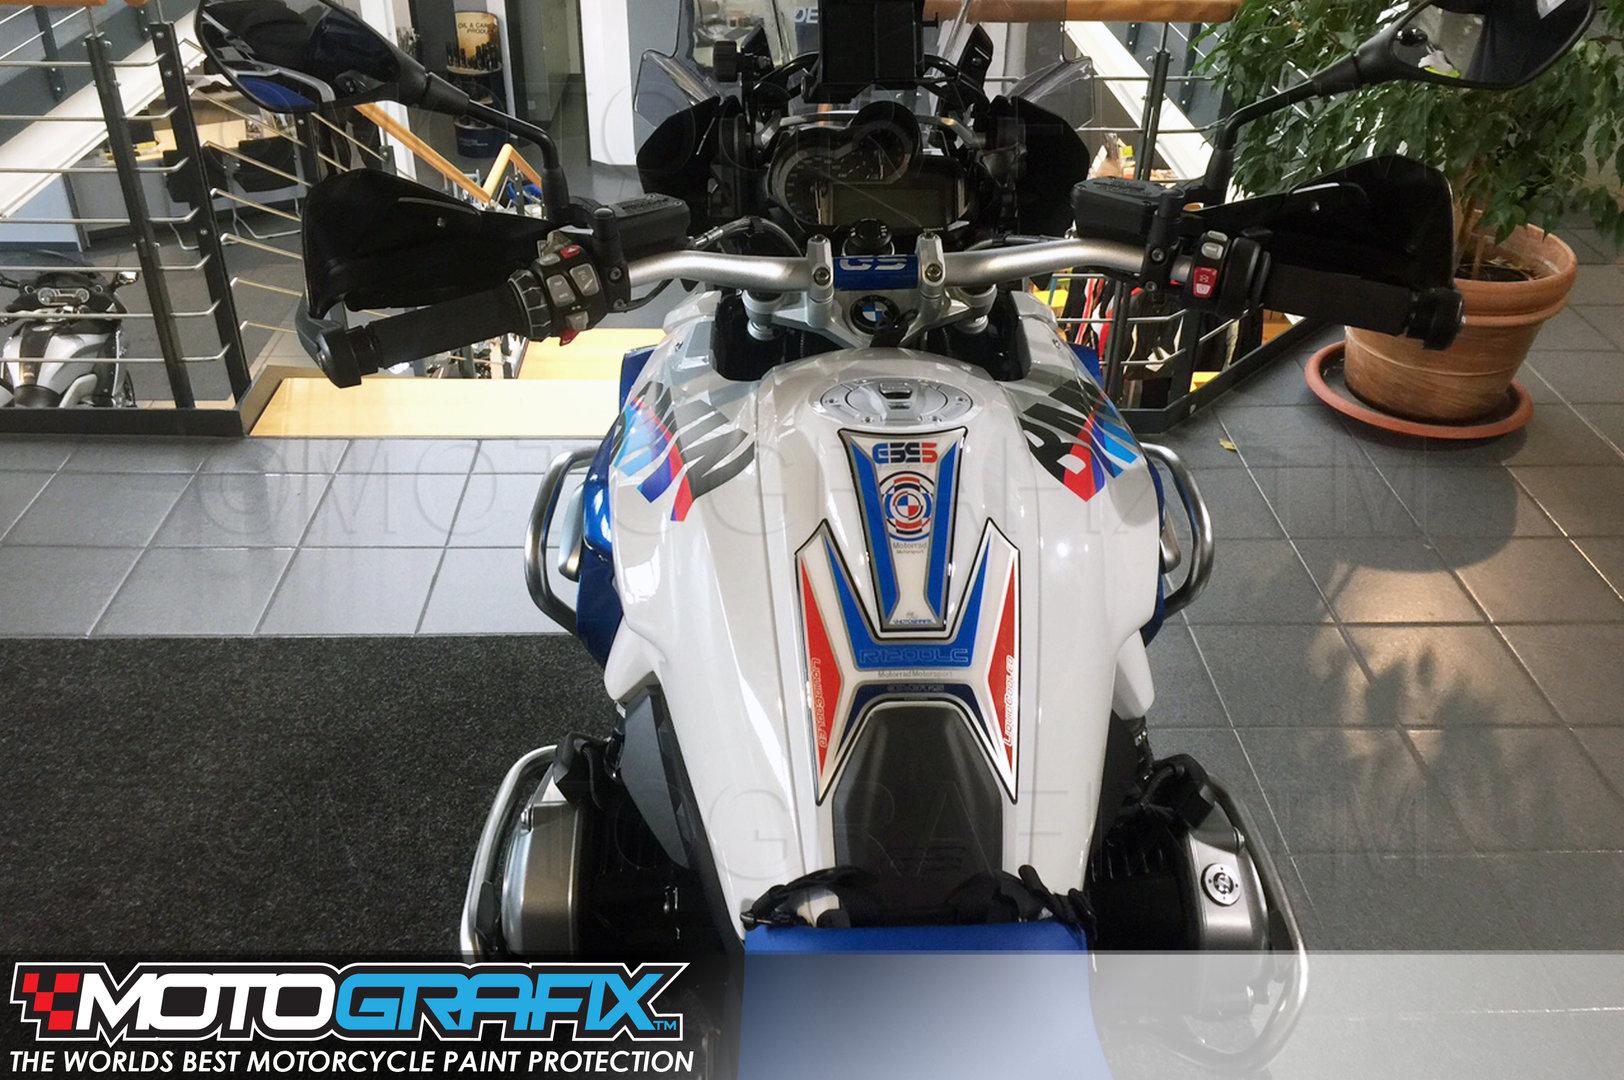 Bmw R1200gs 2013 14 15 16 Motorsport Motorcycle Tank Pad